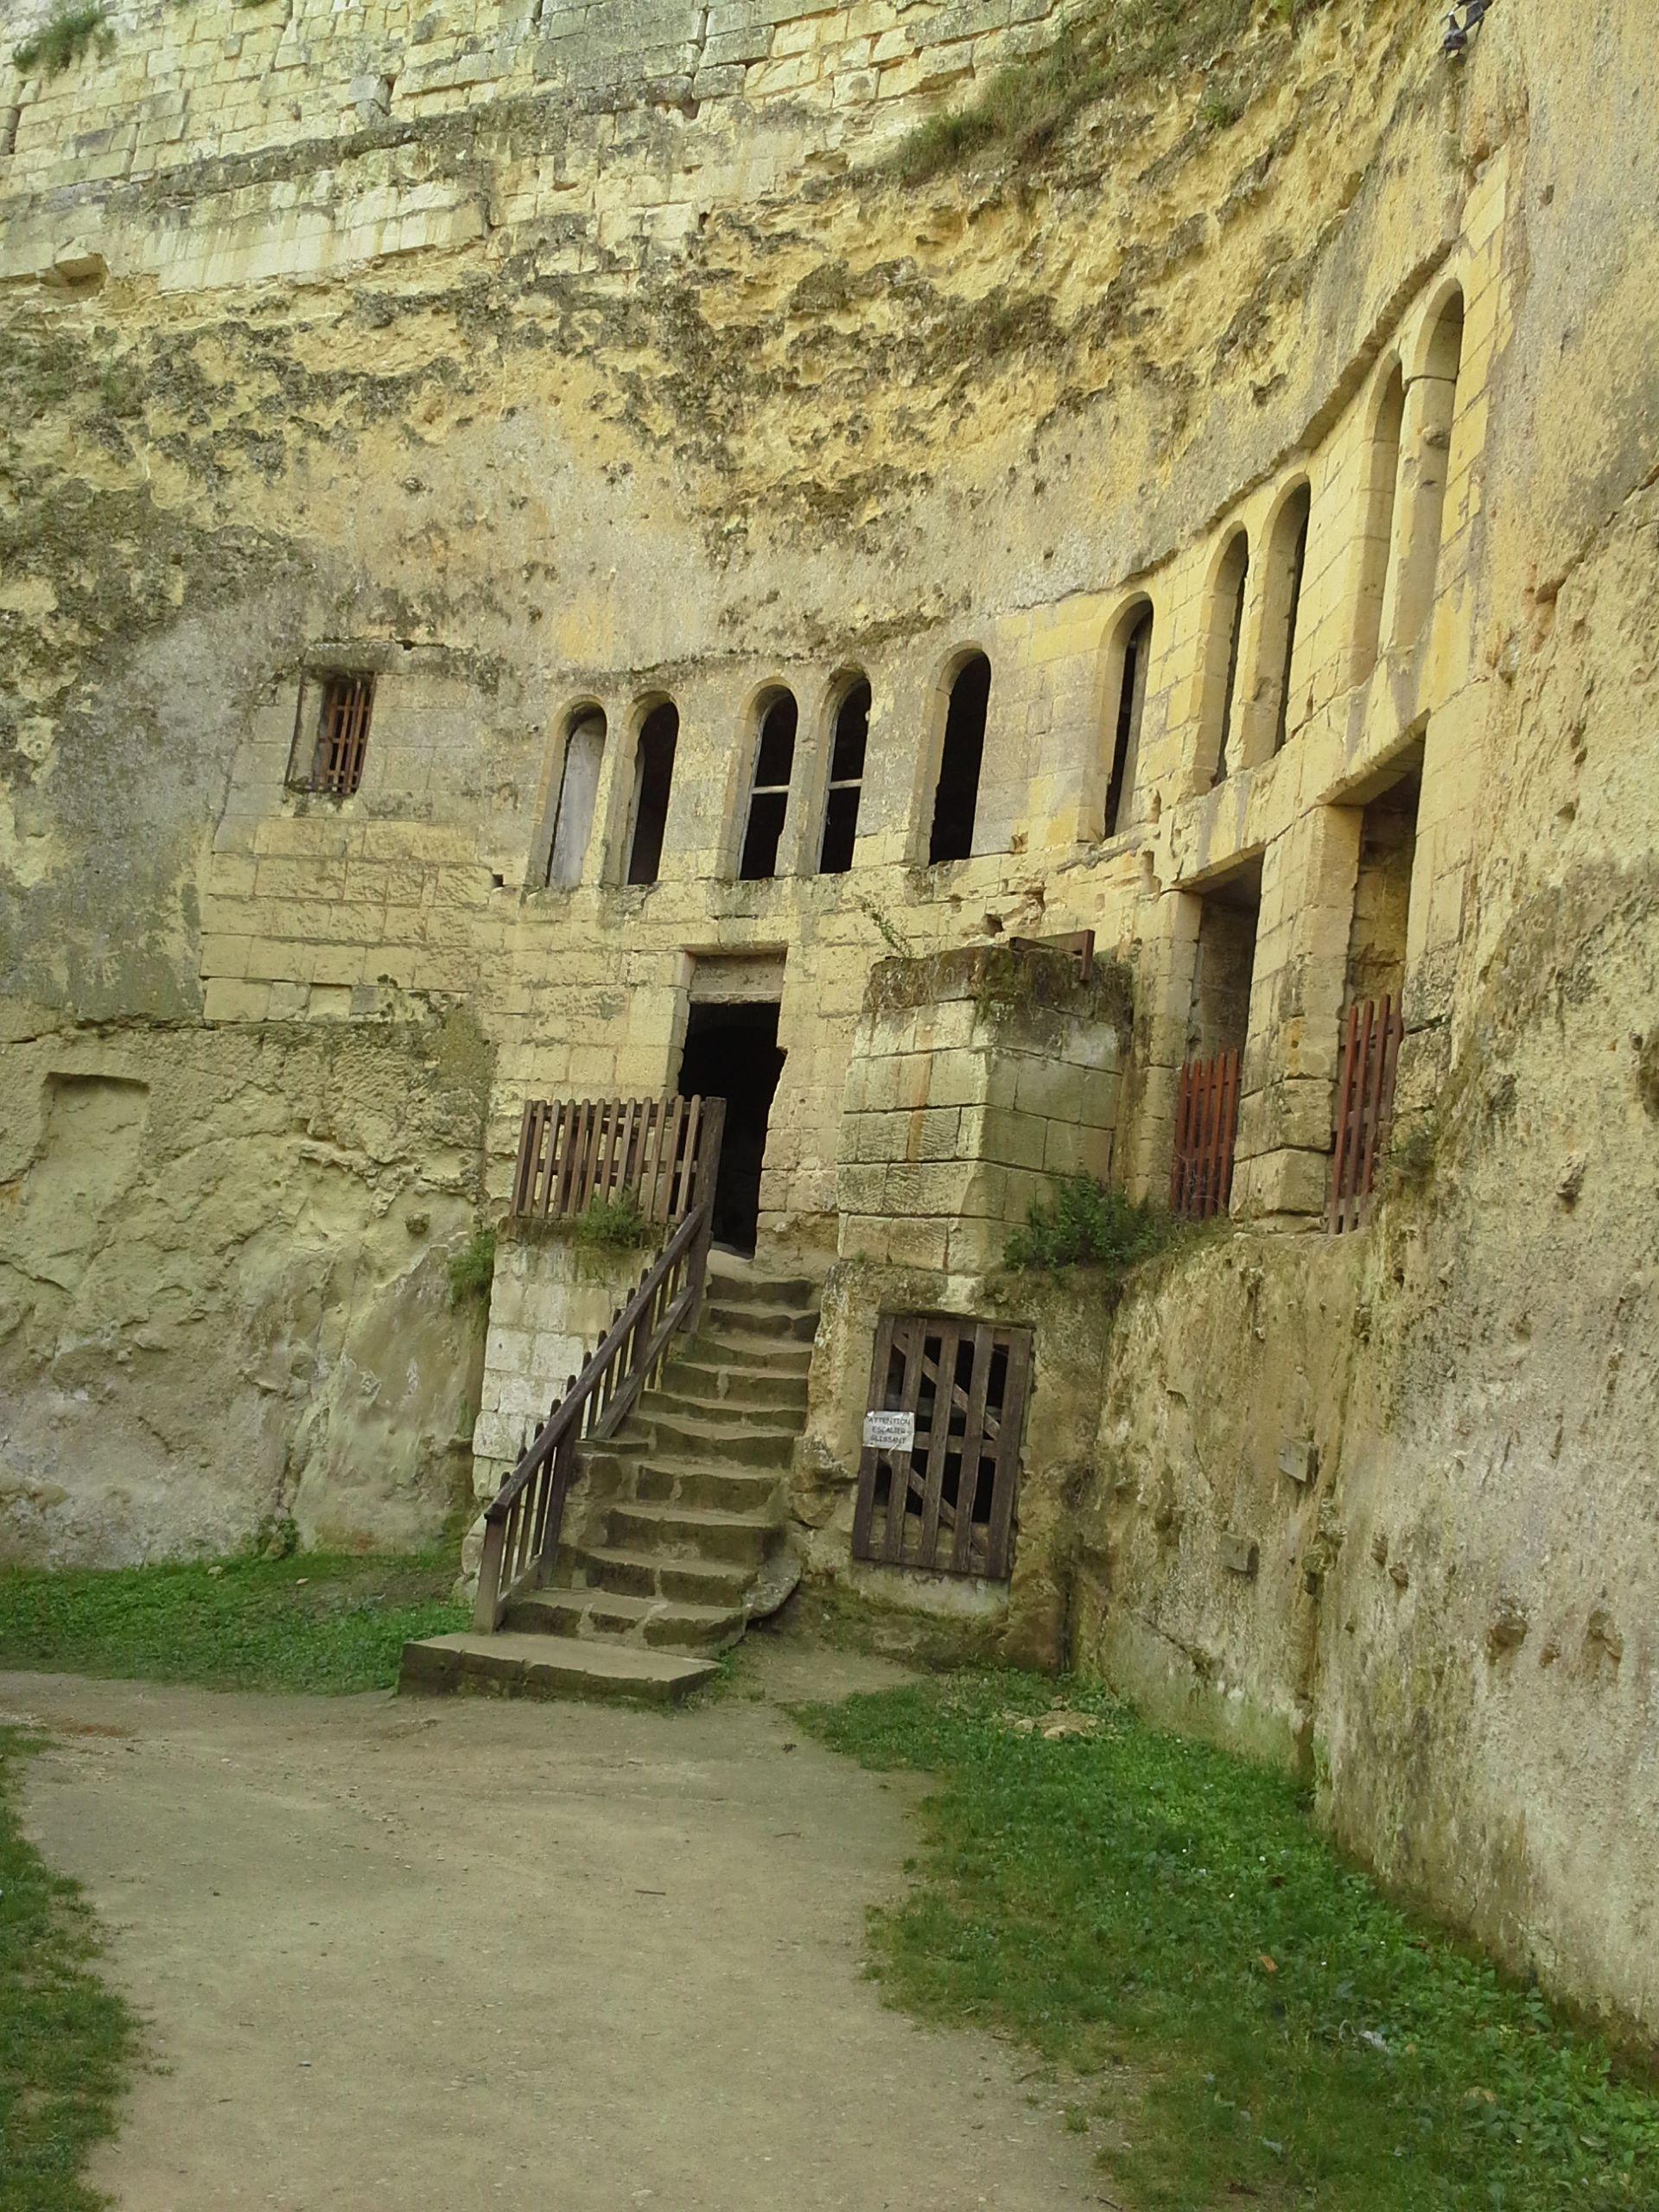 Chateau de breze loire valley france troglodyte caves for Architecture troglodyte